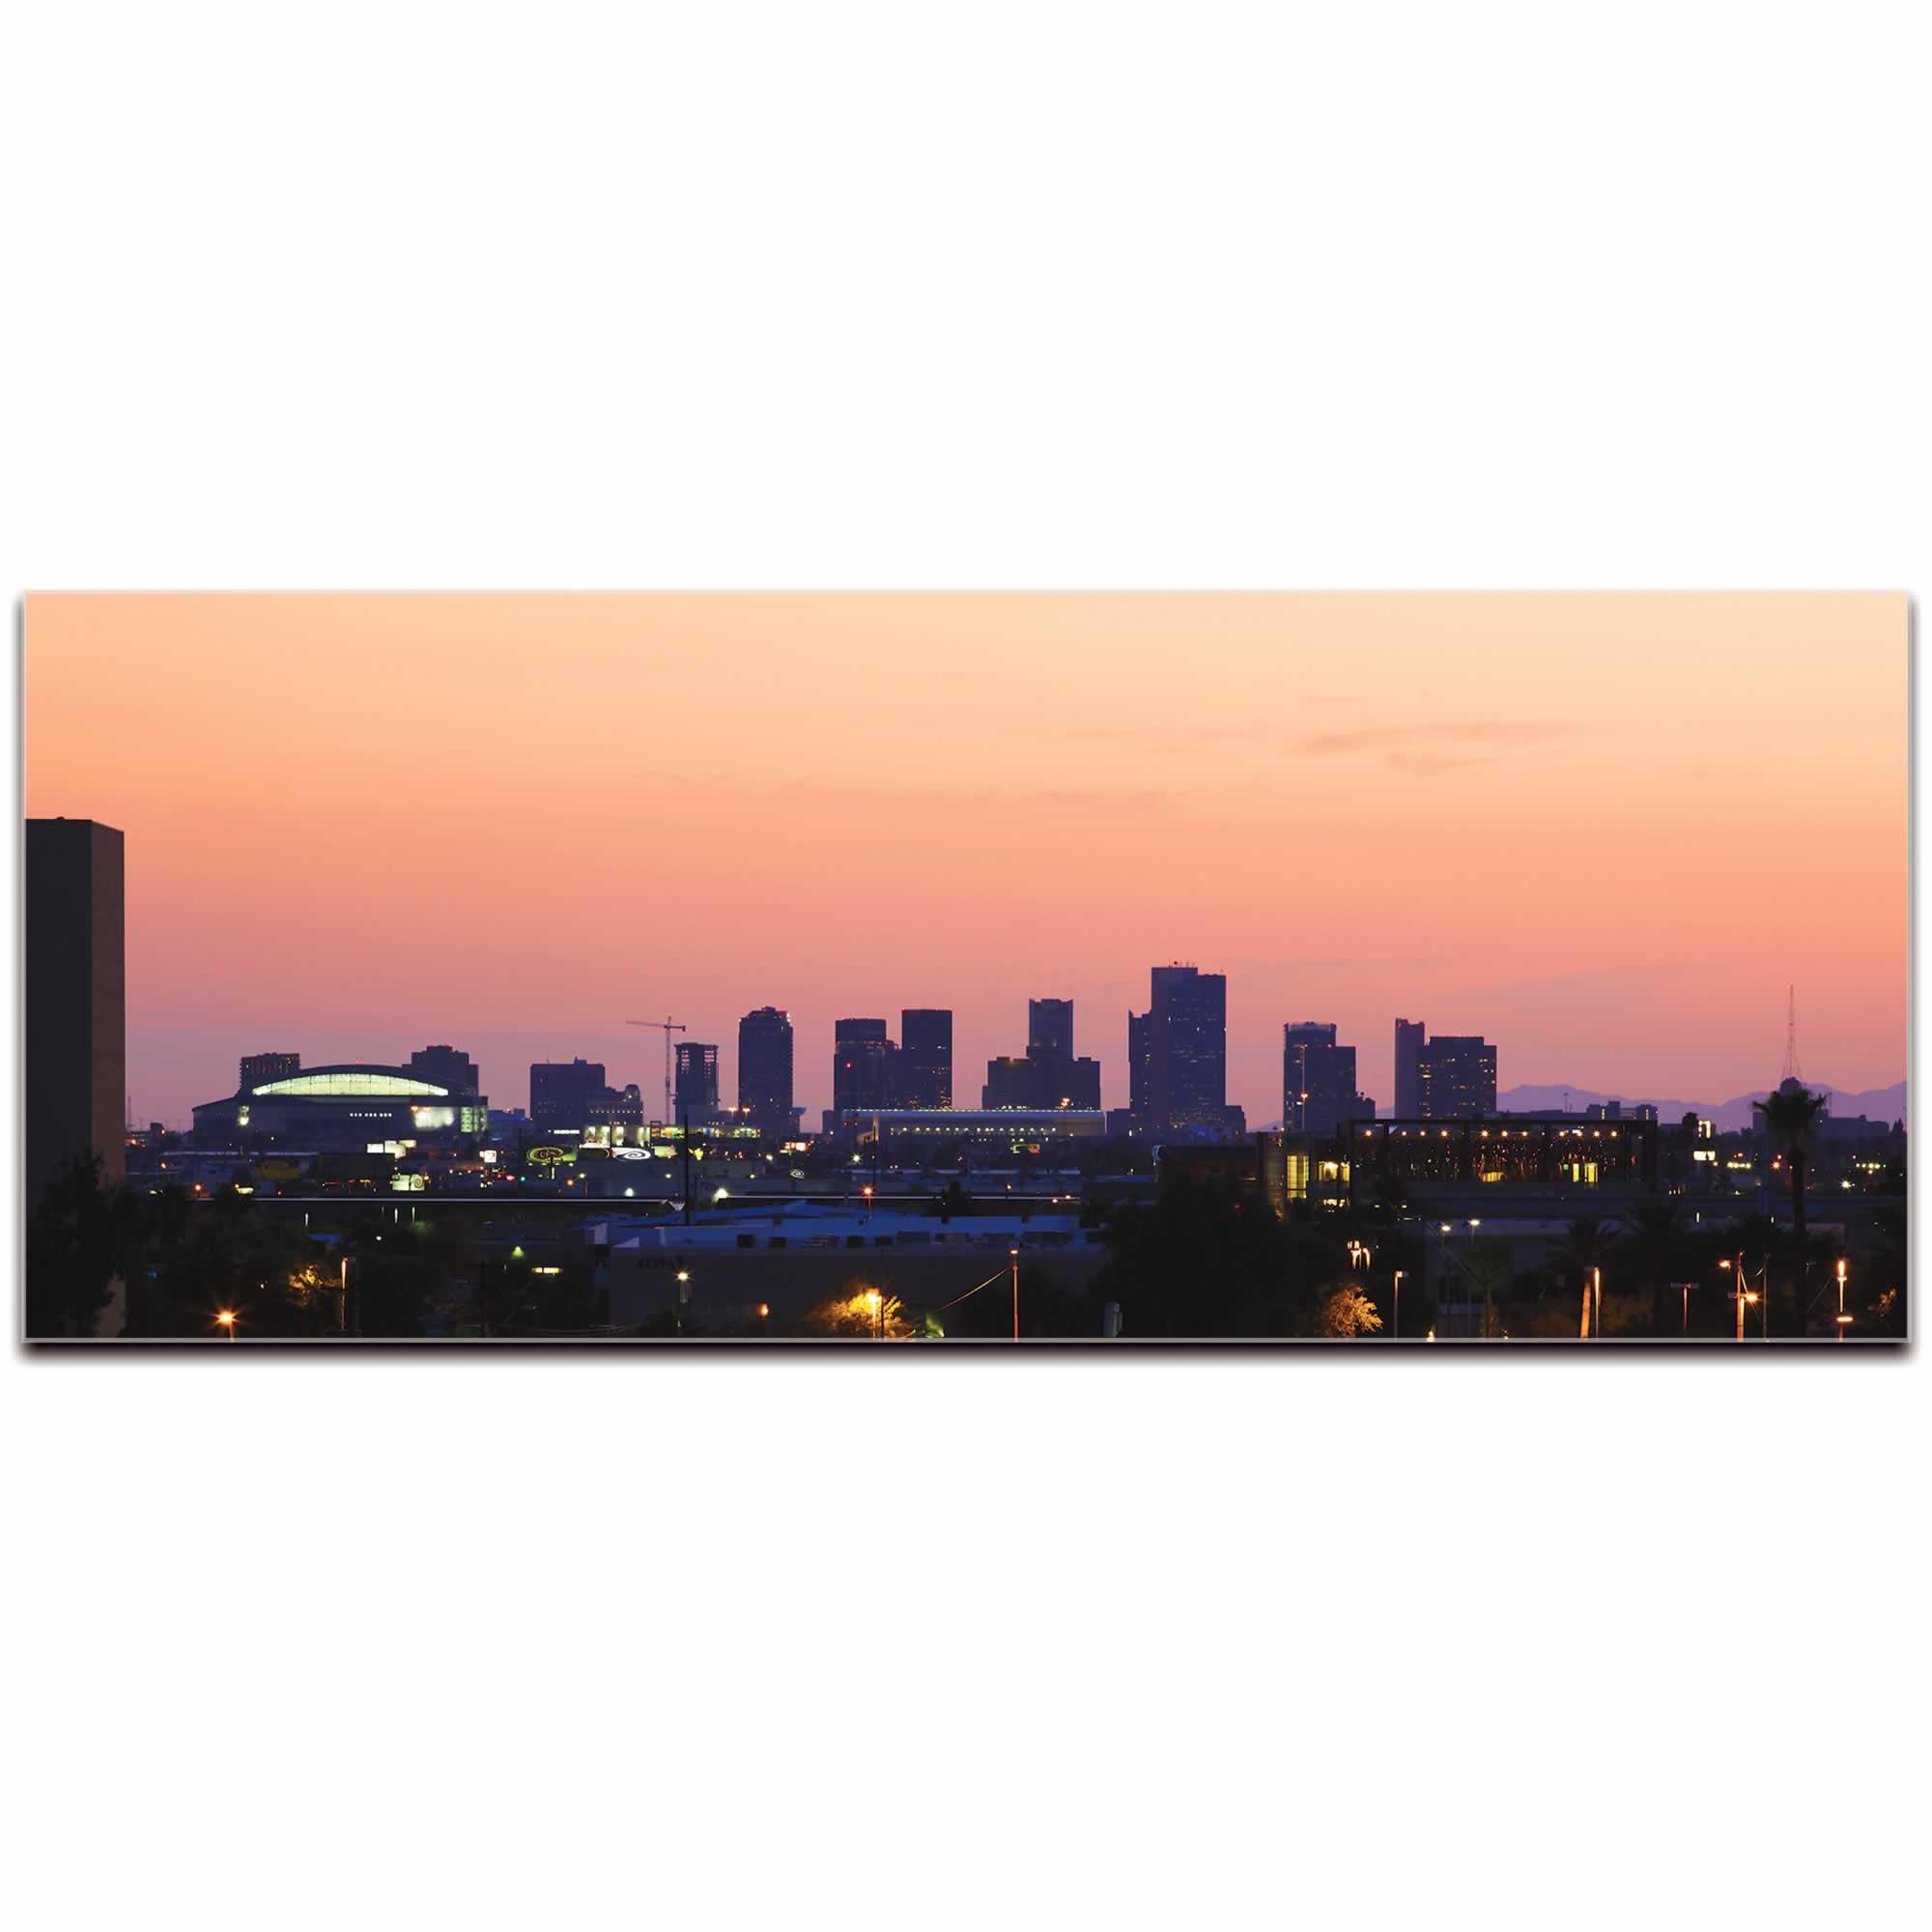 Phoenix City Skyline - Urban Modern Art, Designer Home Decor, Cityscape Wall Artwork, Trendy Contemporary Art